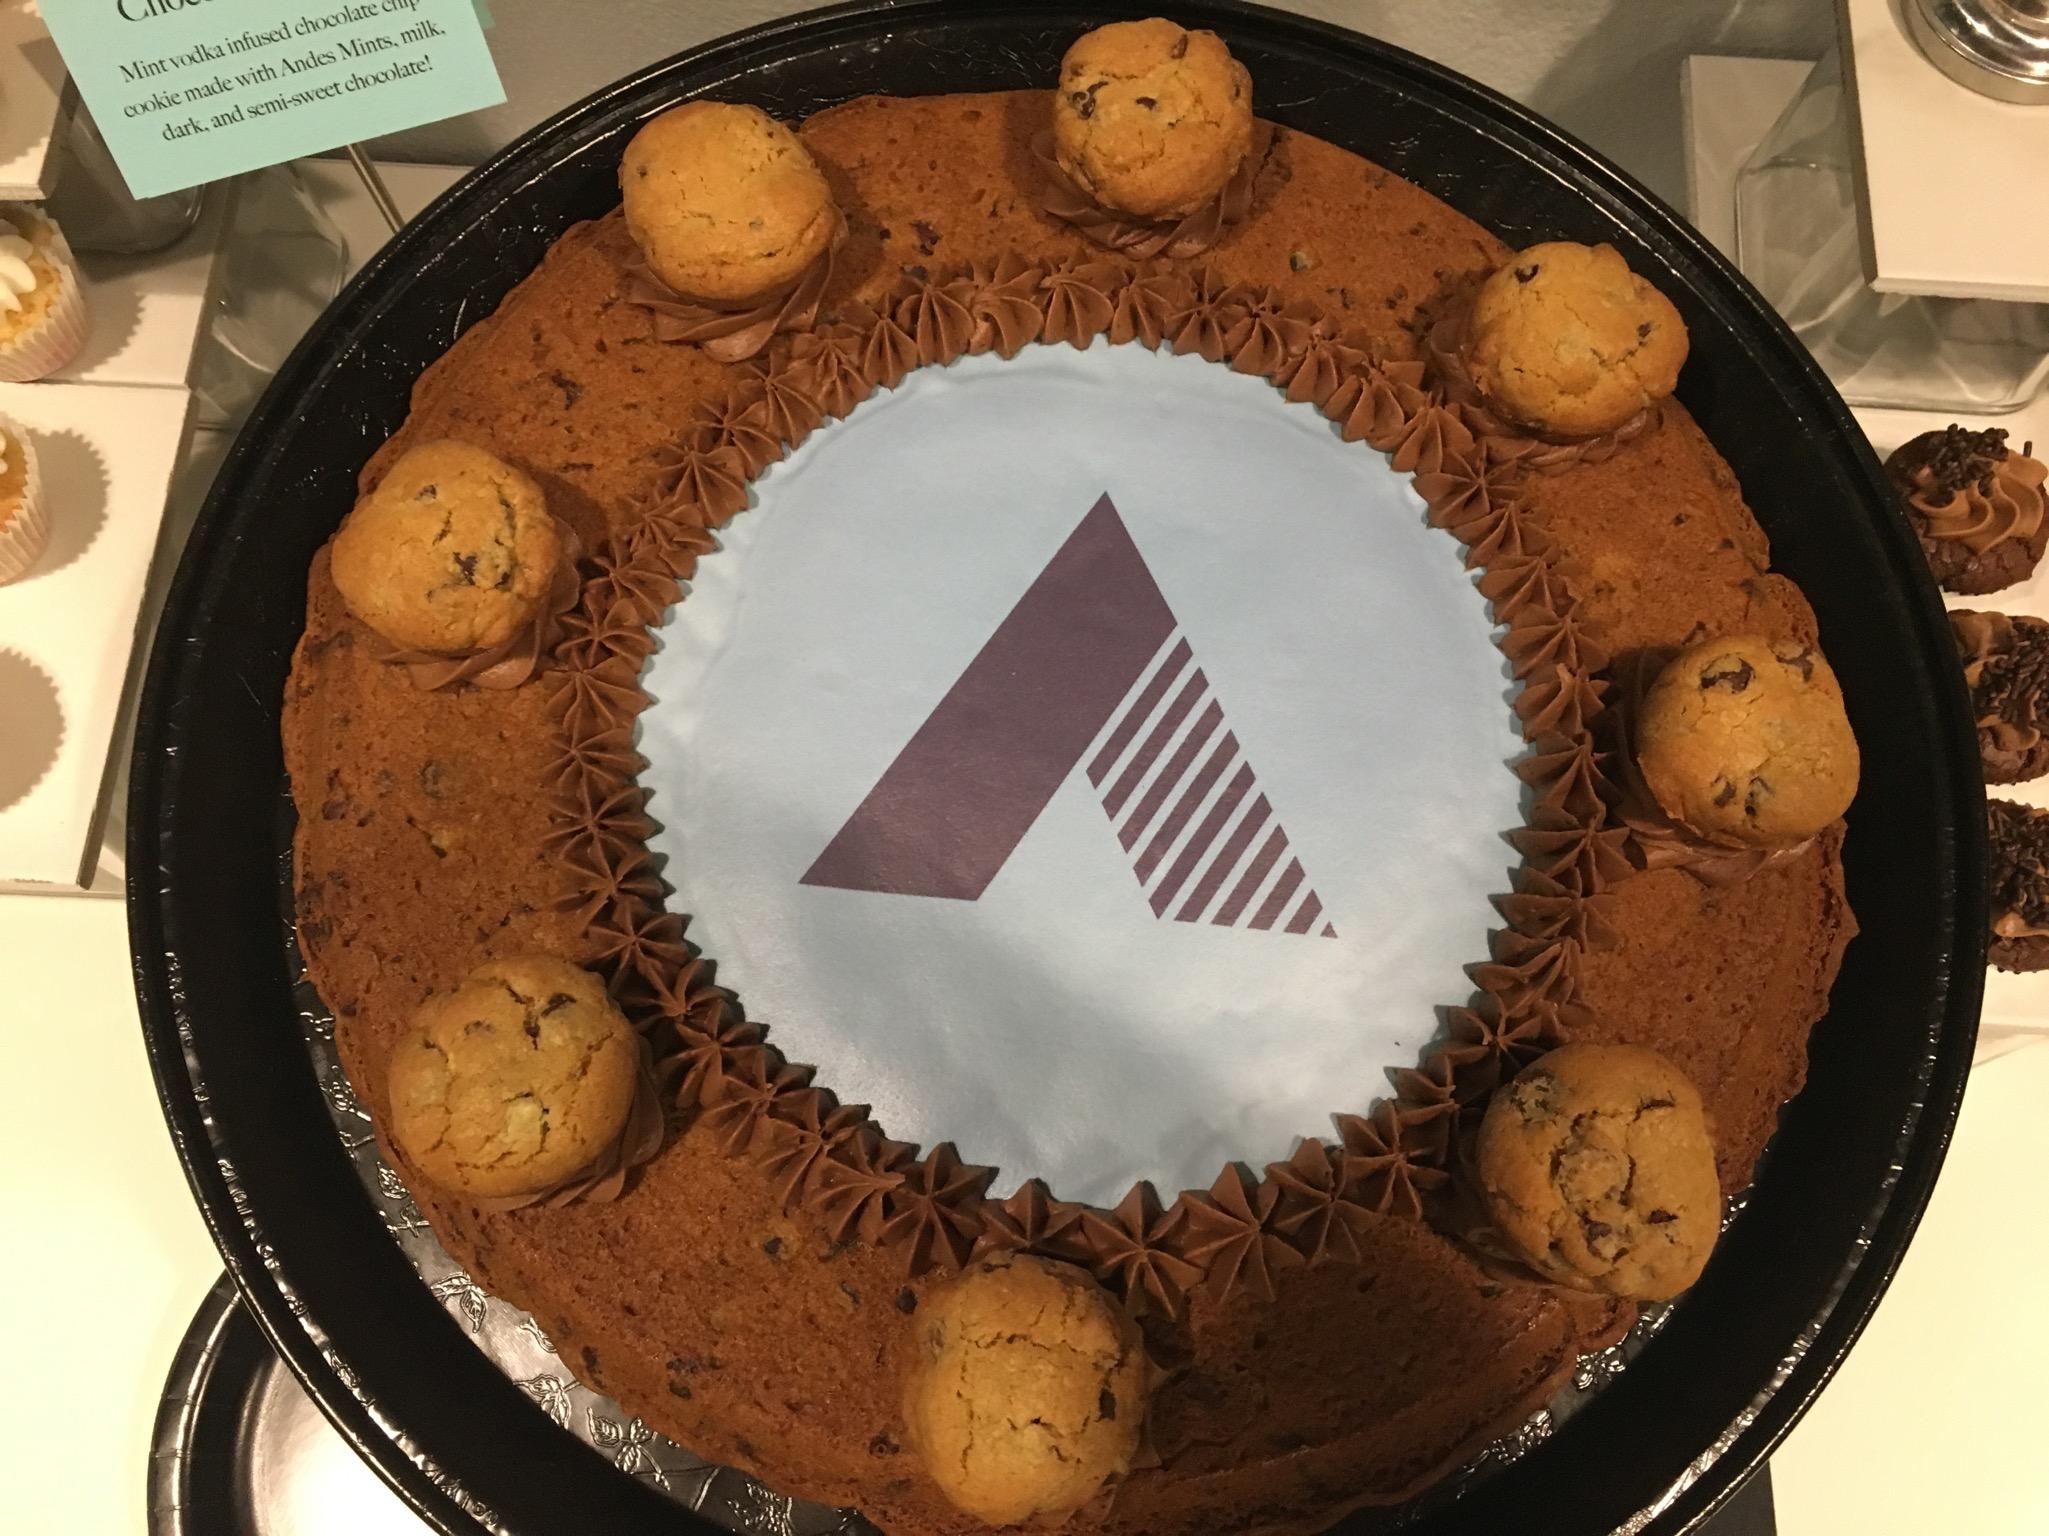 Chocolate Mojito Cake